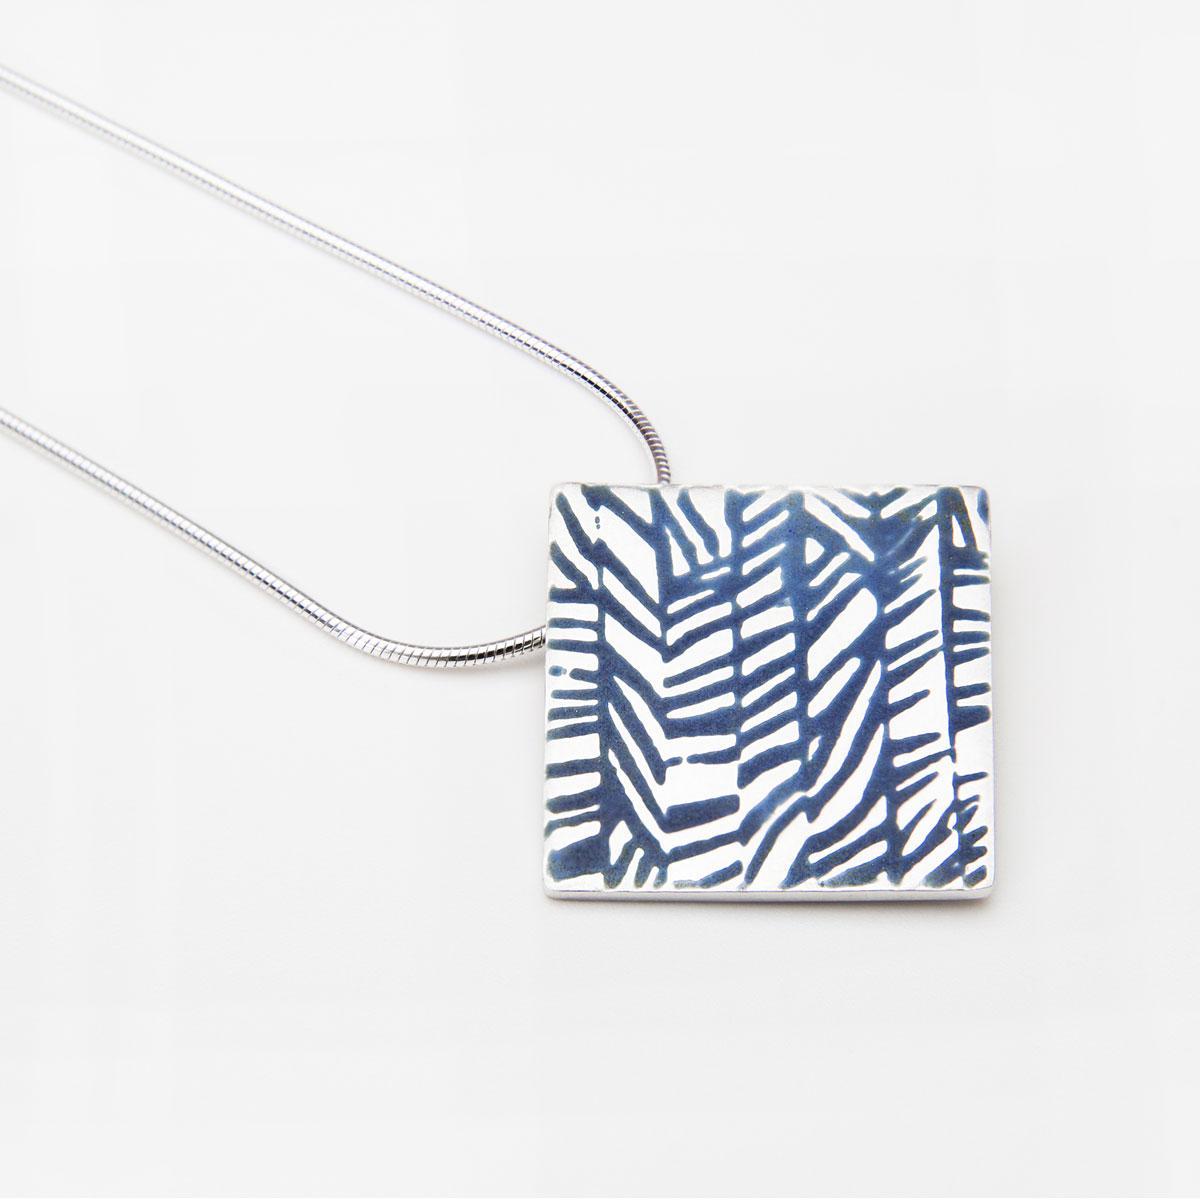 'Weave' Blue-Grey Square Pendant